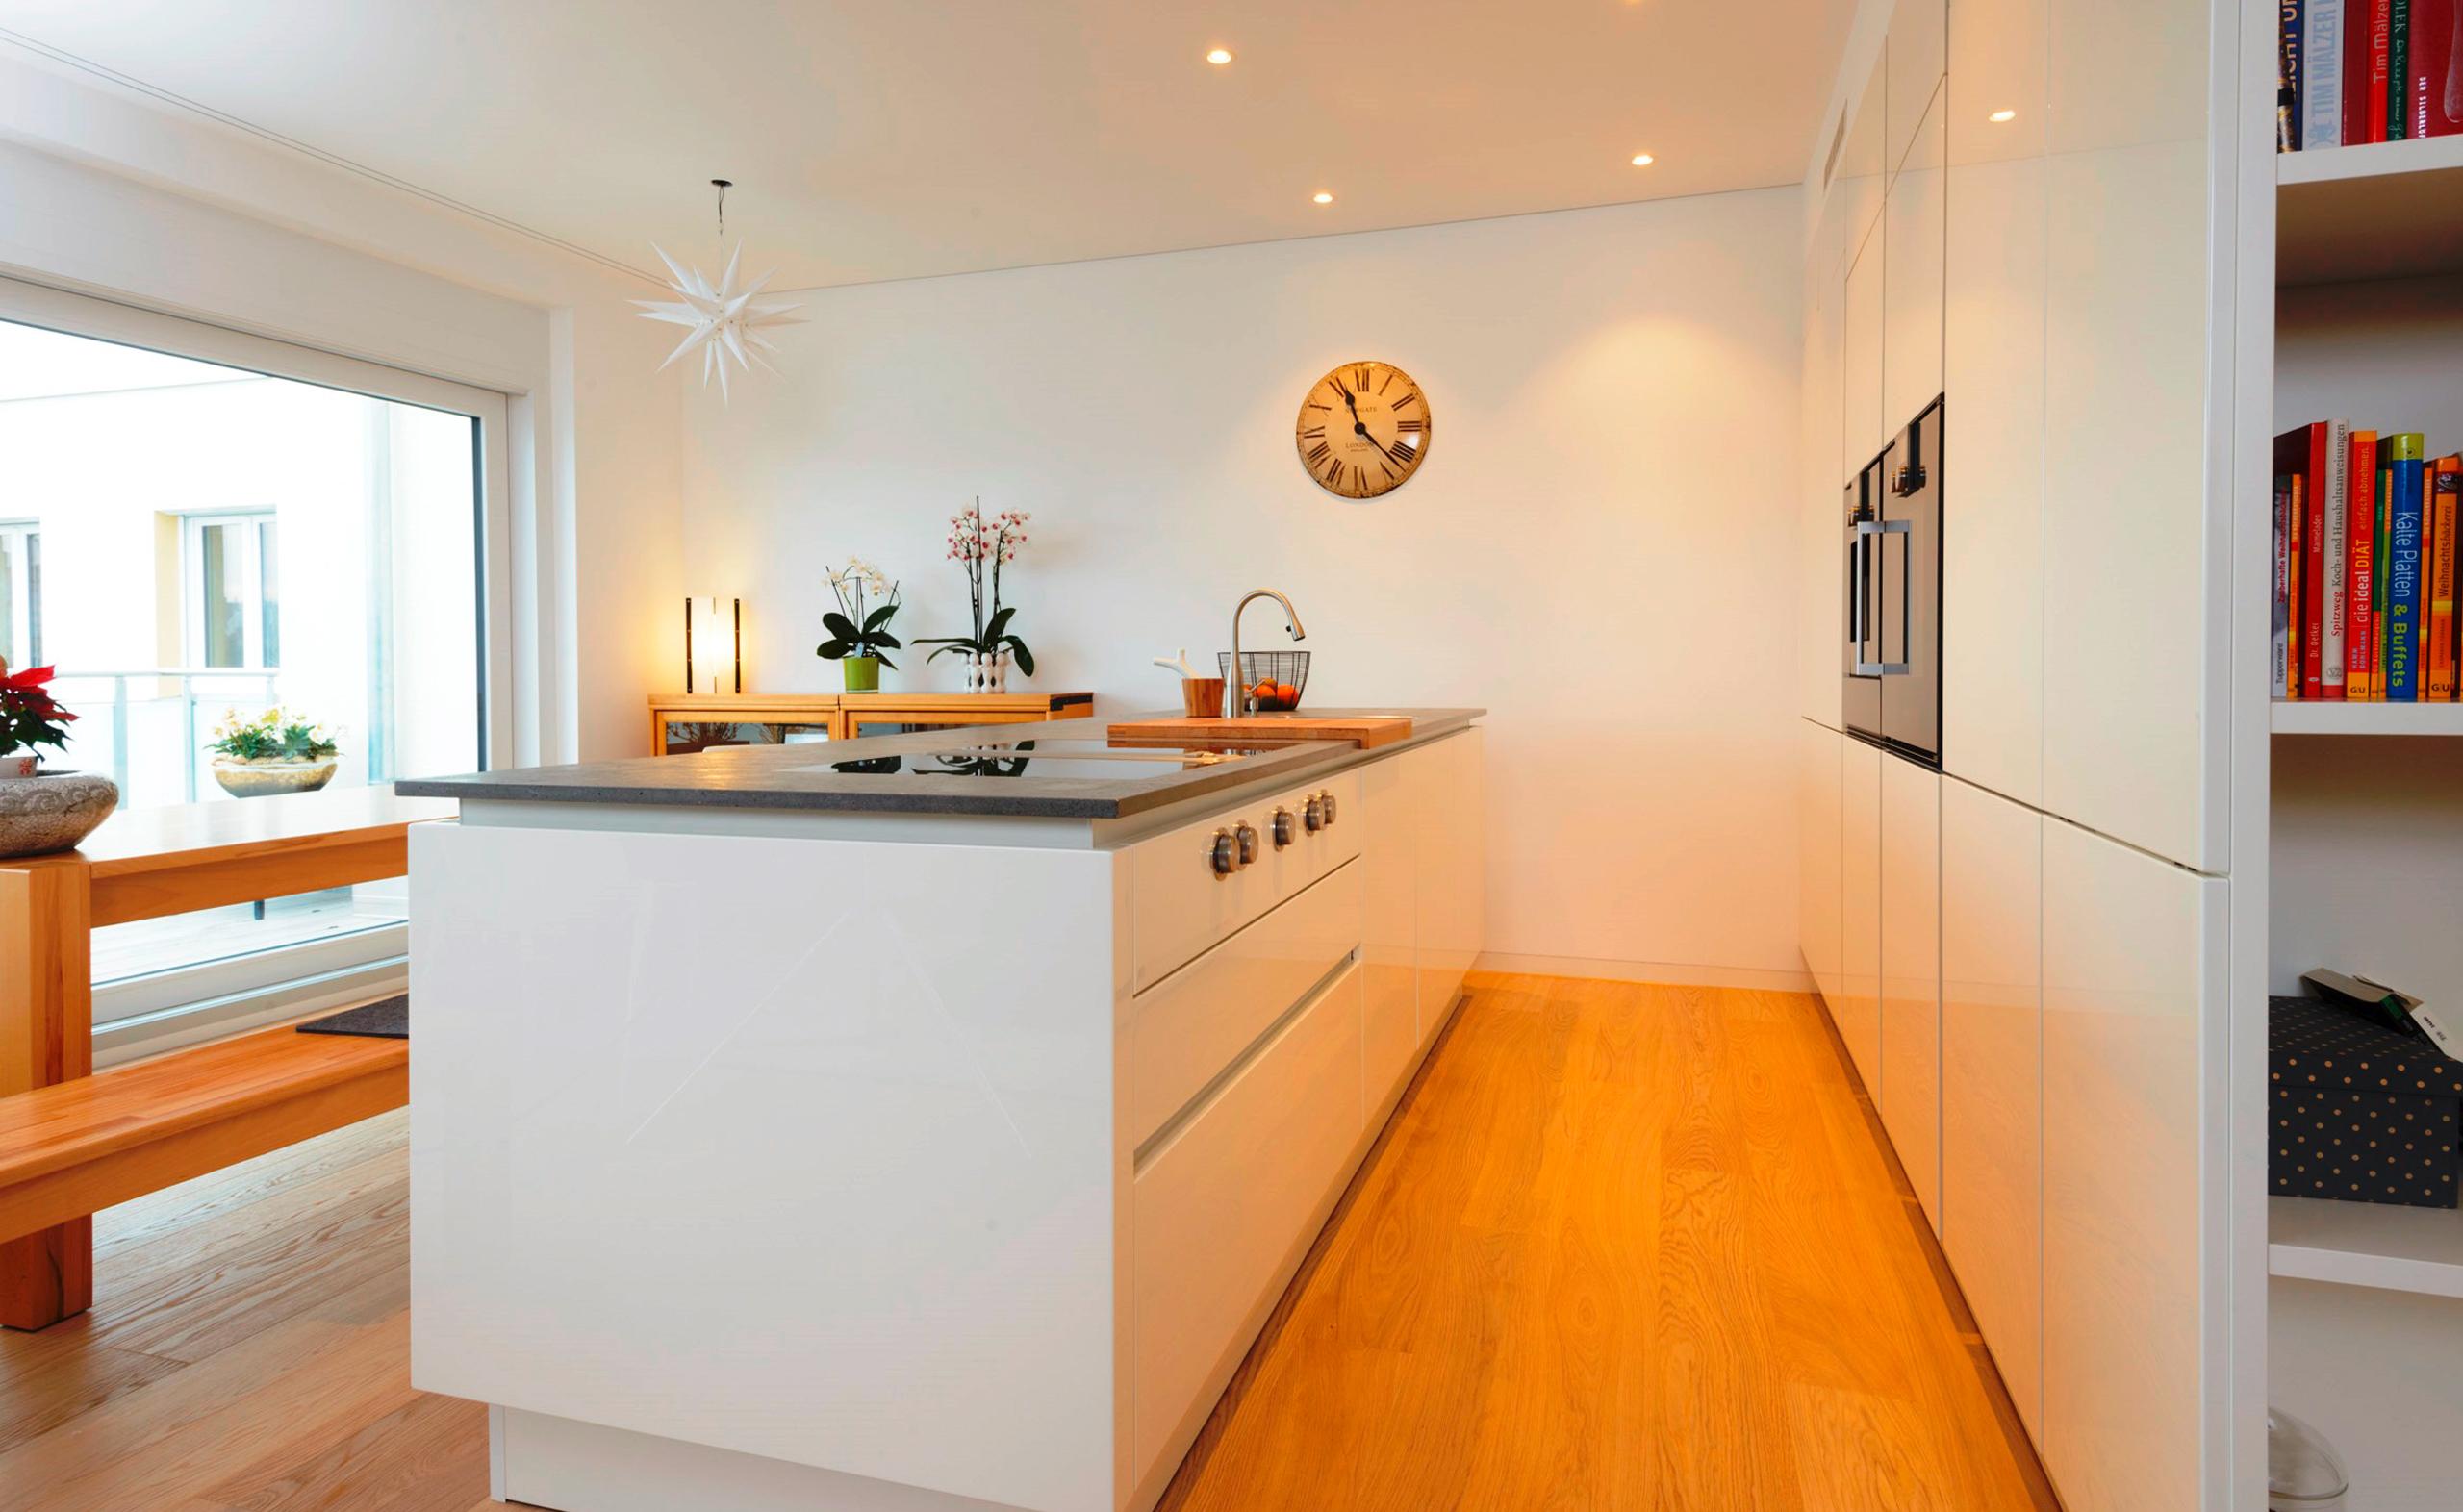 Penthouse-Wohnung in Radolfzell